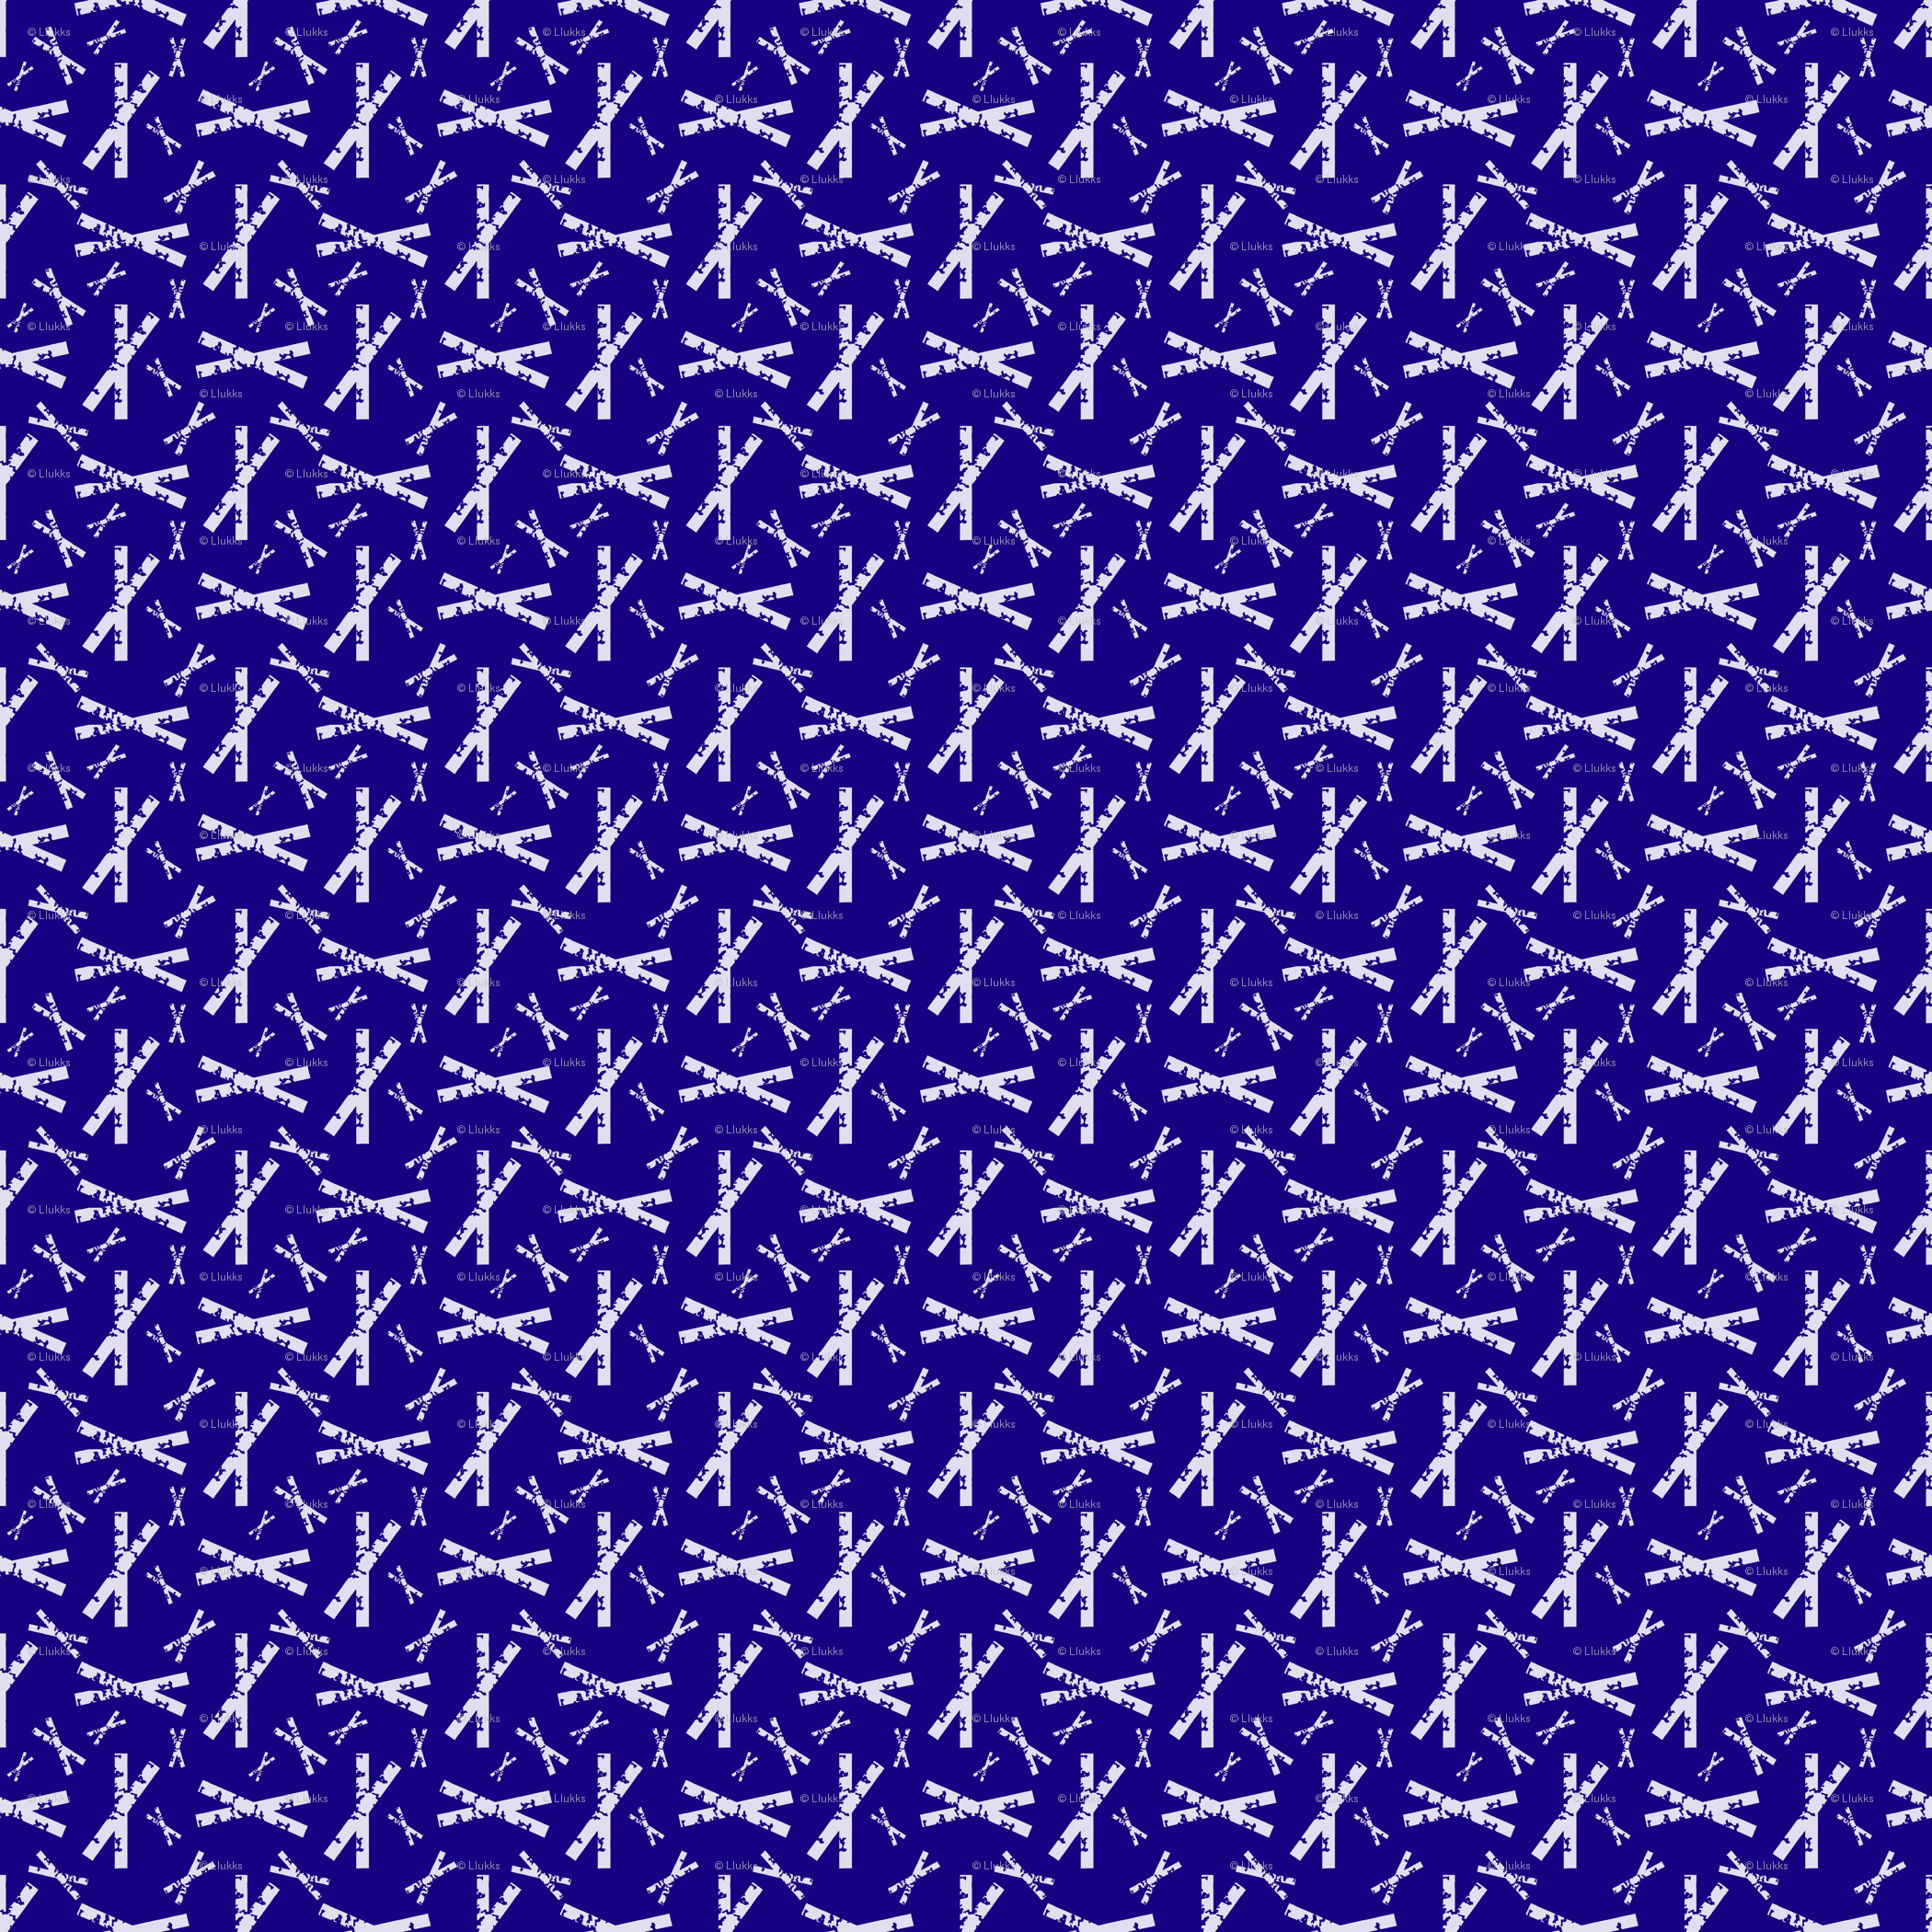 Crisscross White On Dark Purple Upholstery Fabric Fabric Llukks